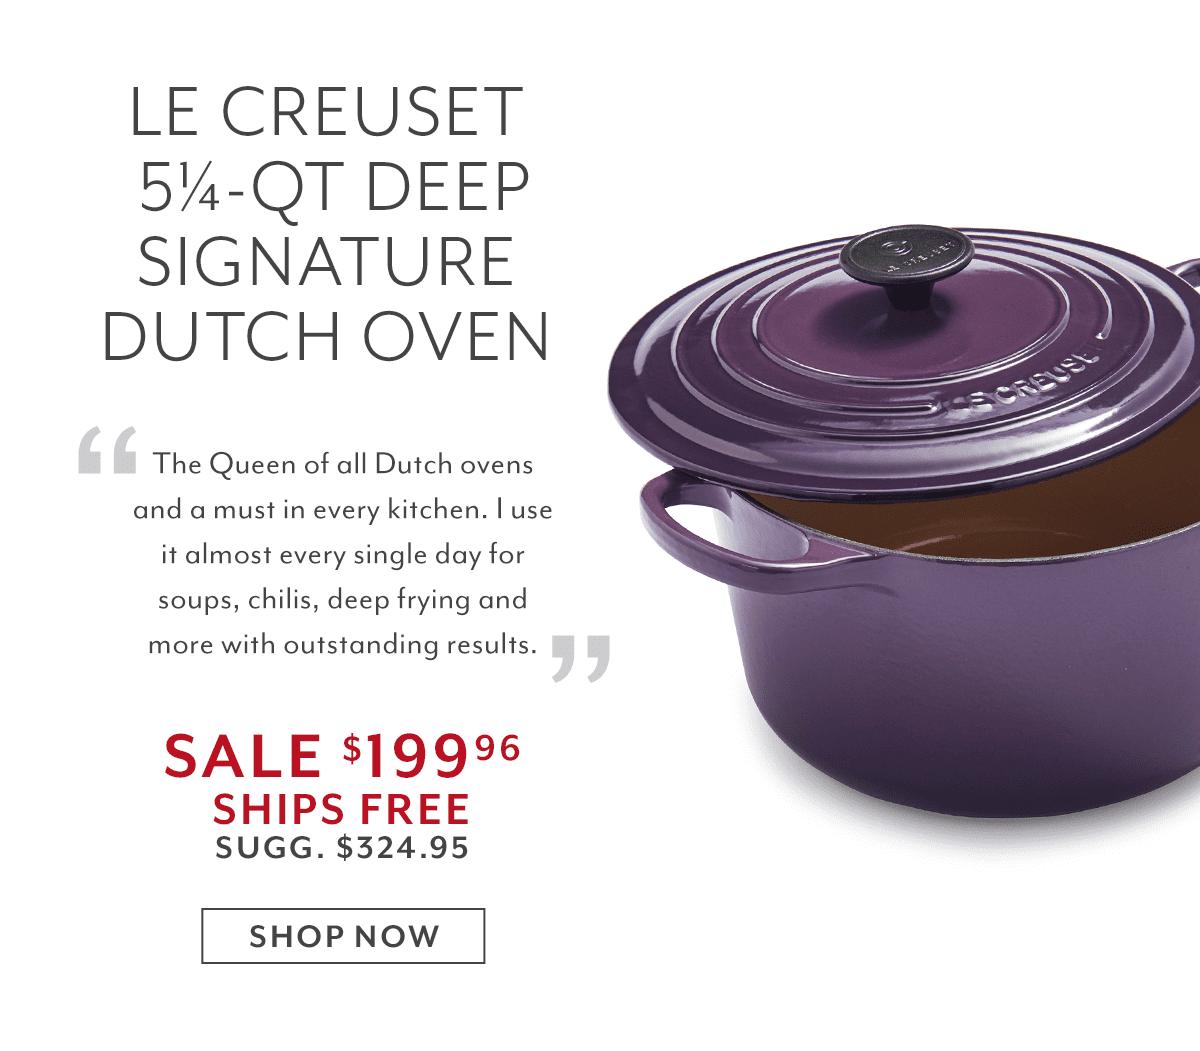 Le Creuset Signature Deep Round Dutch Oven, 5.25 qt.